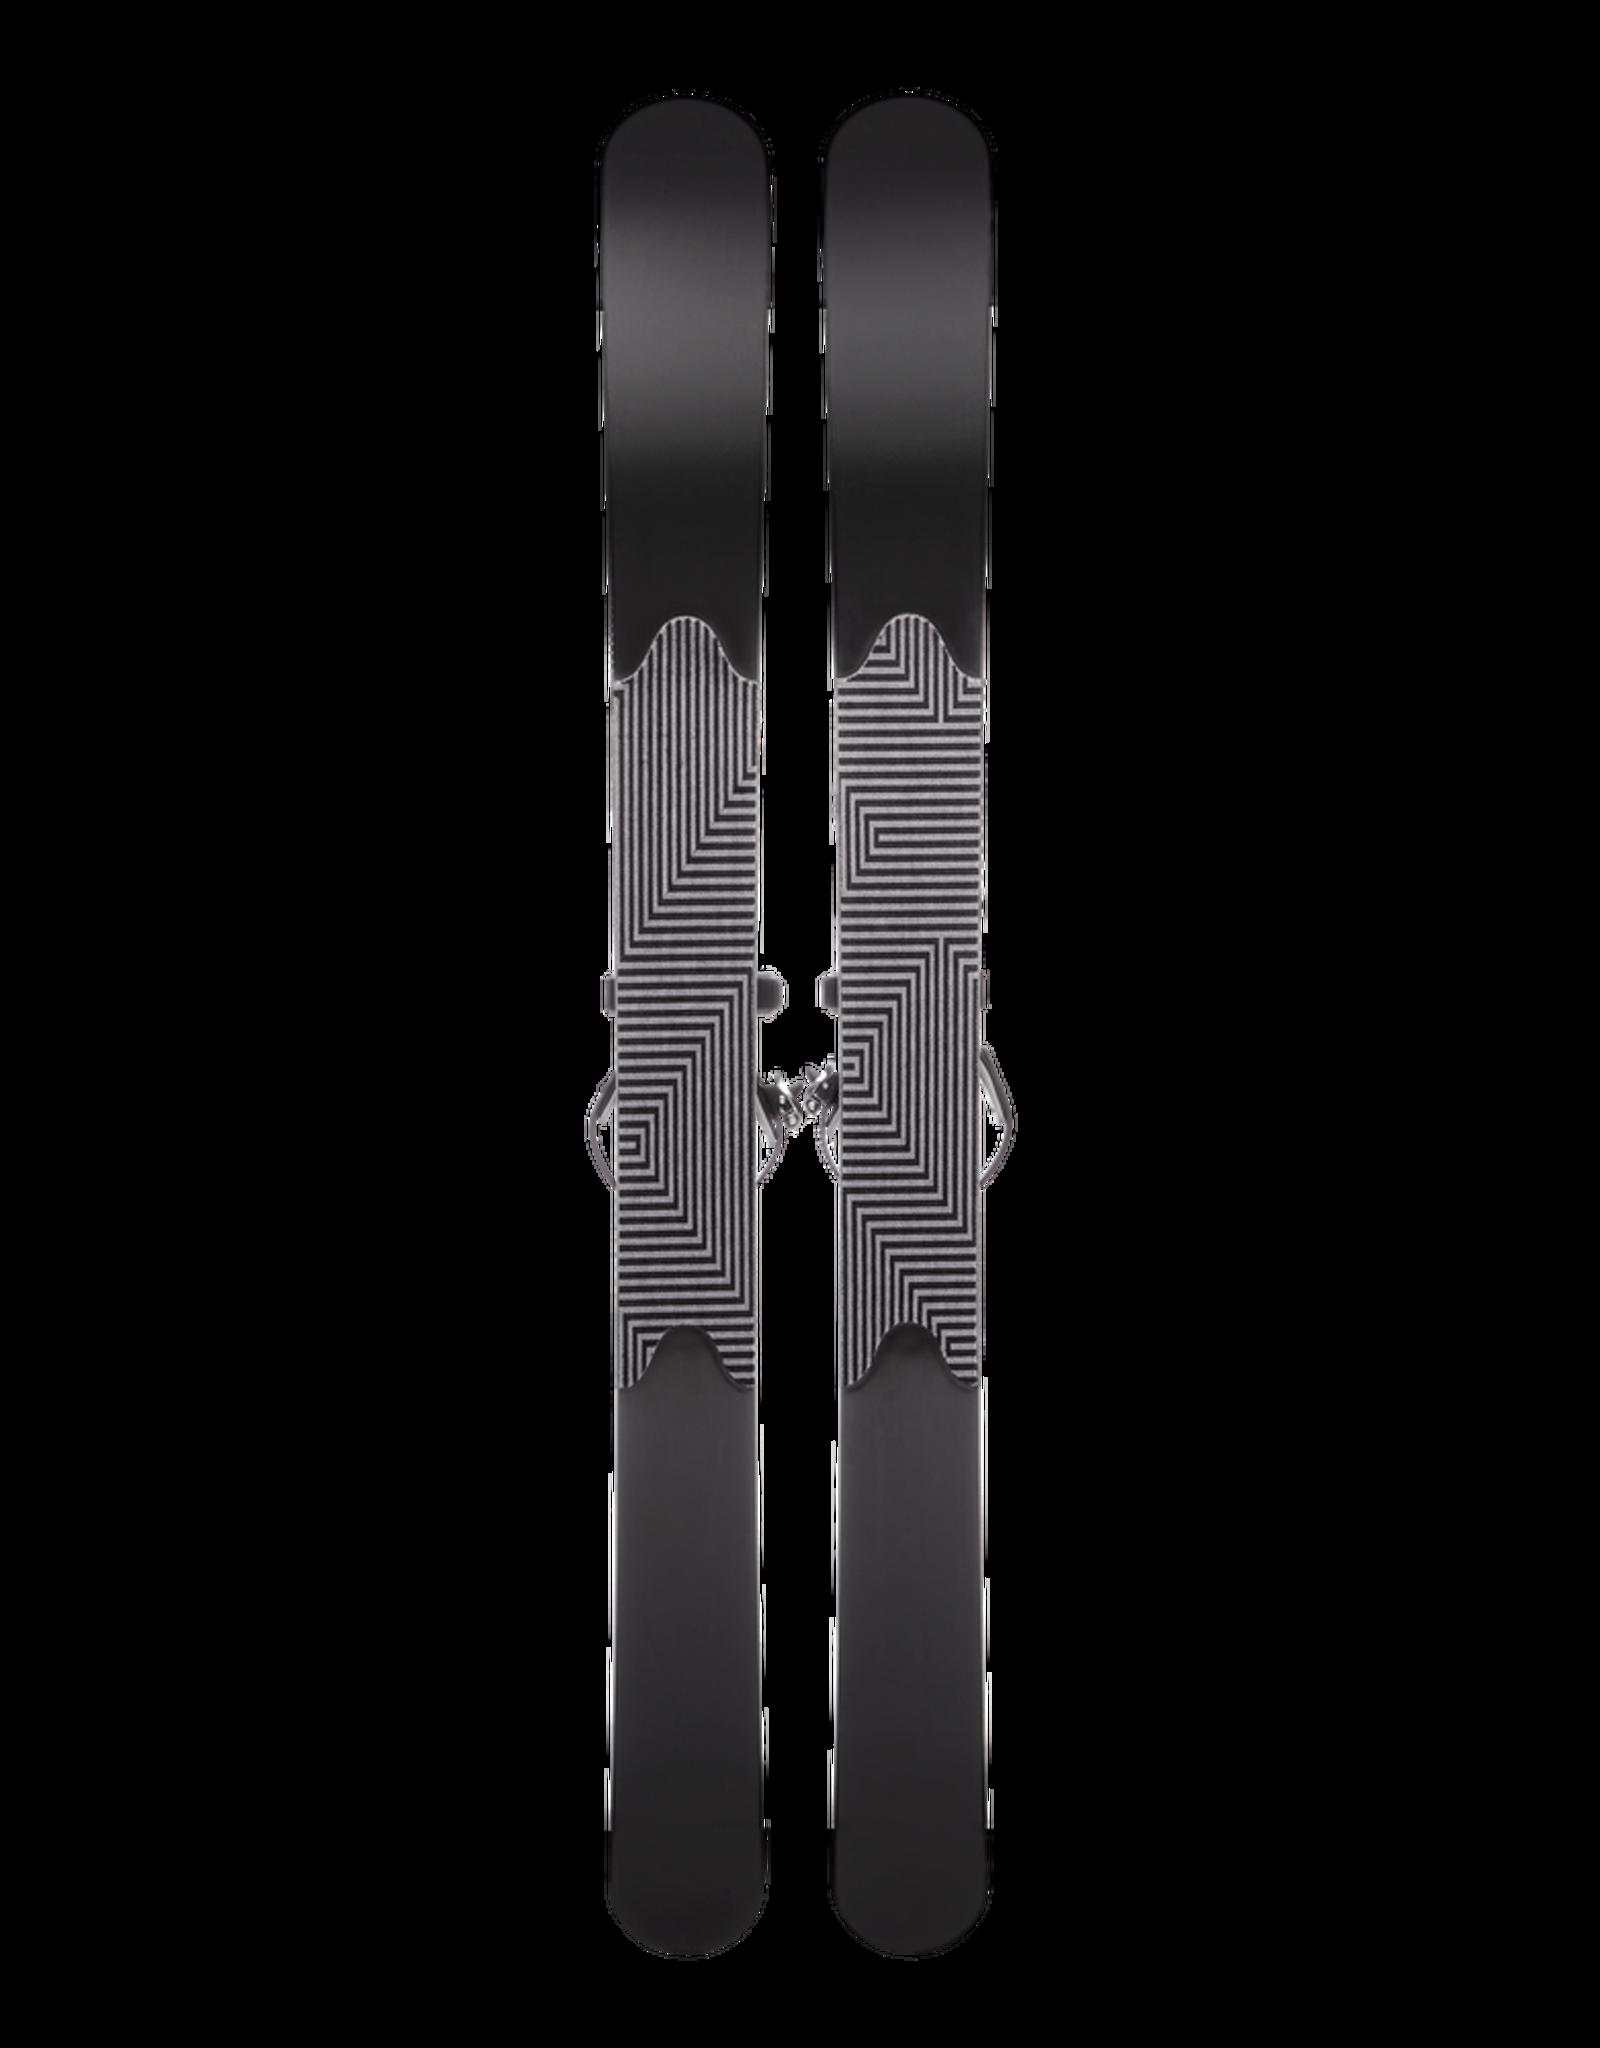 Black Diamond Black Diamond 2022 GlideLite 147 Trek Skis with Universal Bindings 147cm